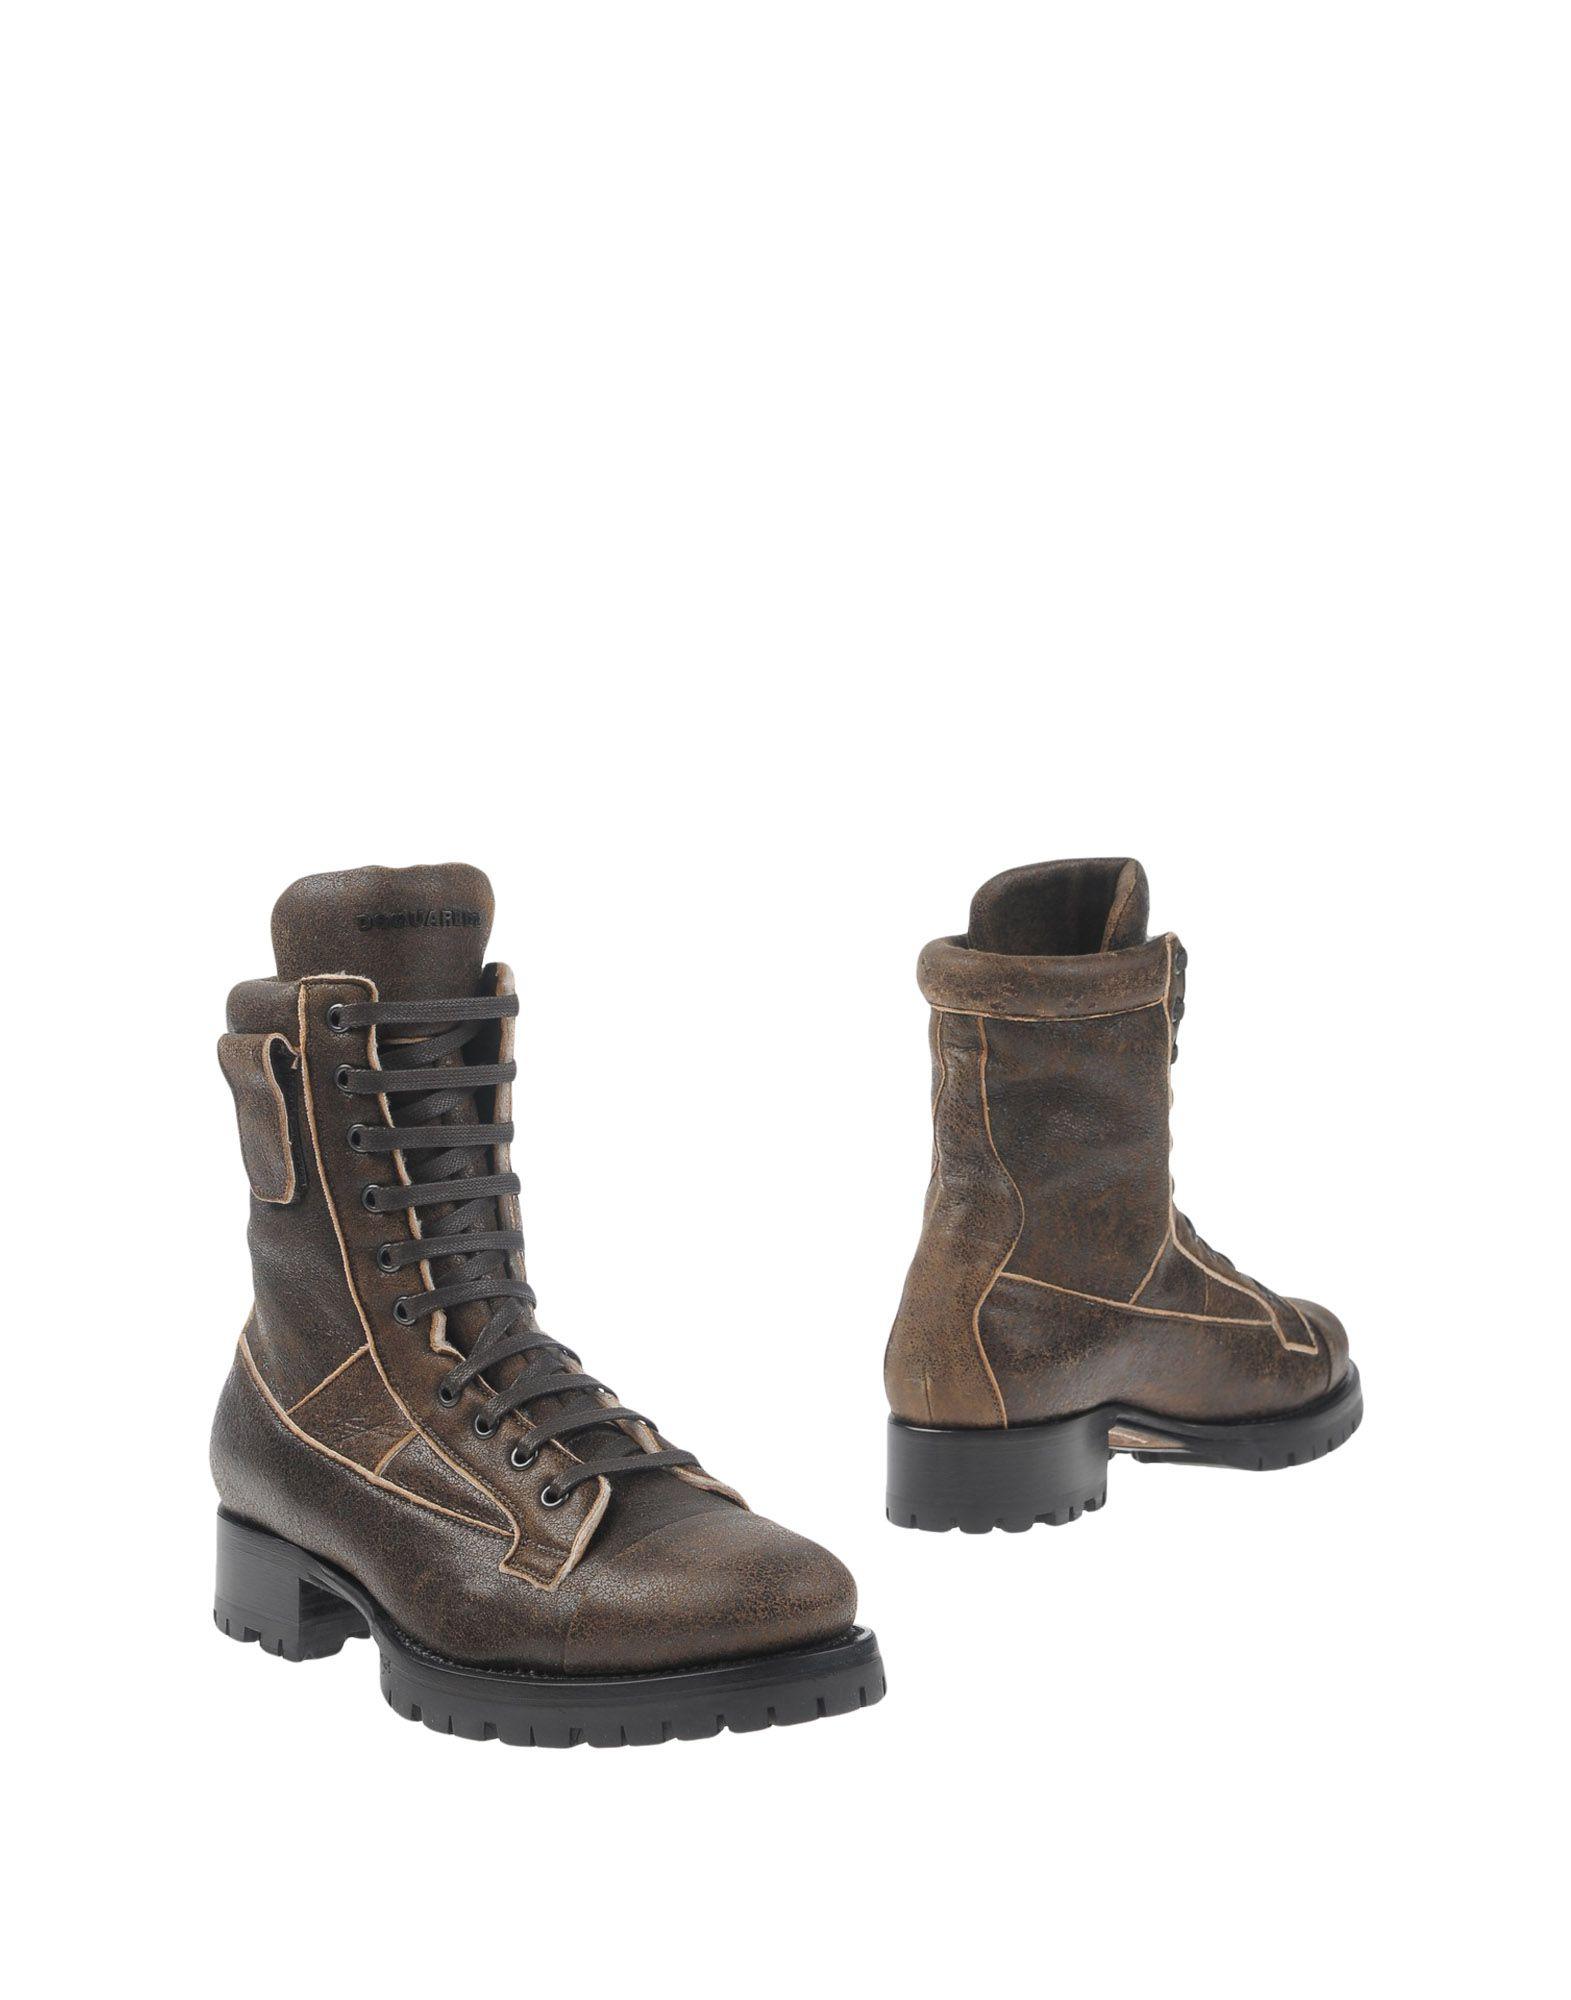 Dsquared2 Stiefelette Herren  Schuhe 11298762FT Gute Qualität beliebte Schuhe  dba31e